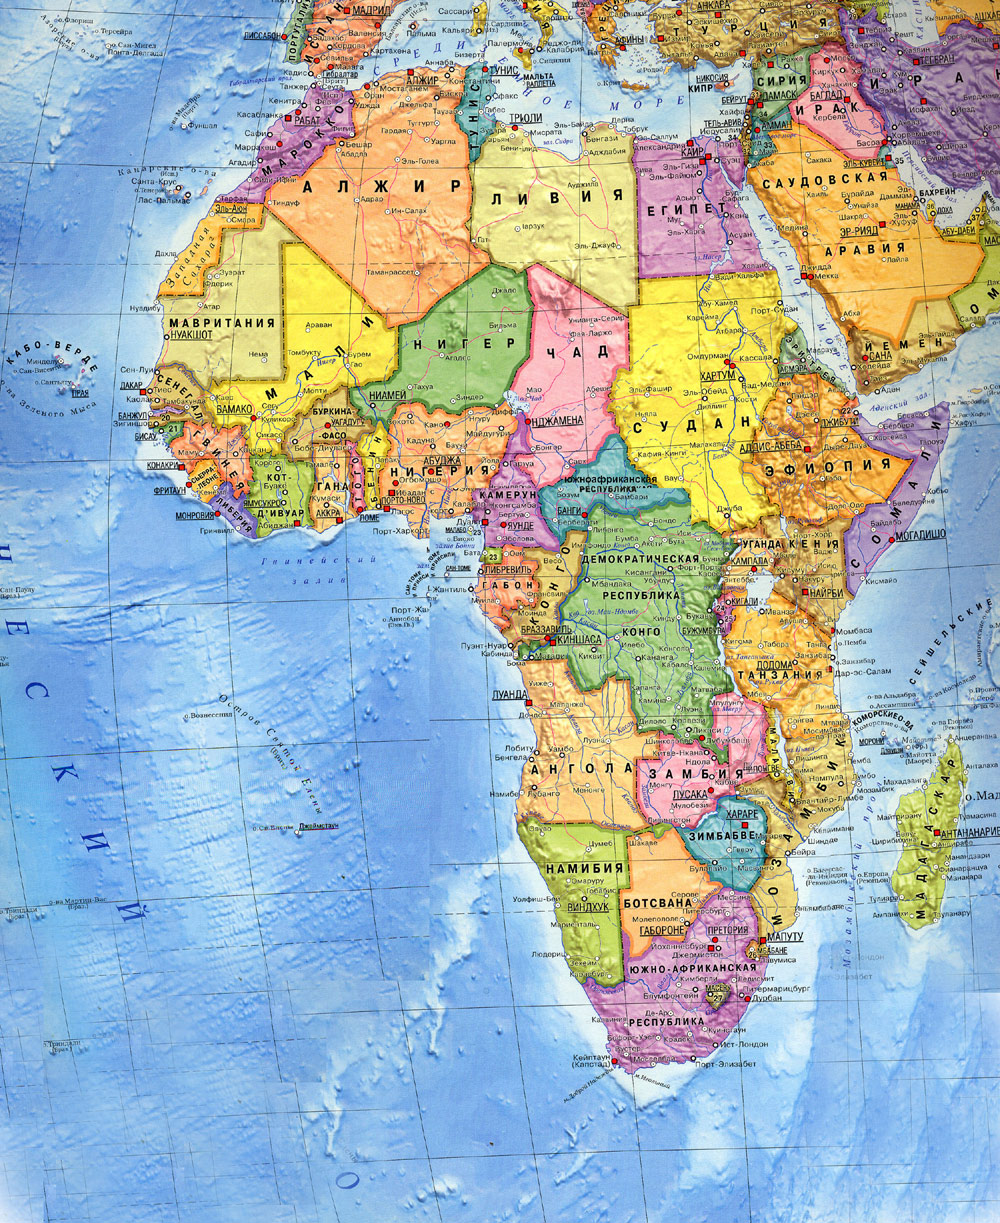 Презентация по географии 7 класса на тему «Африка»